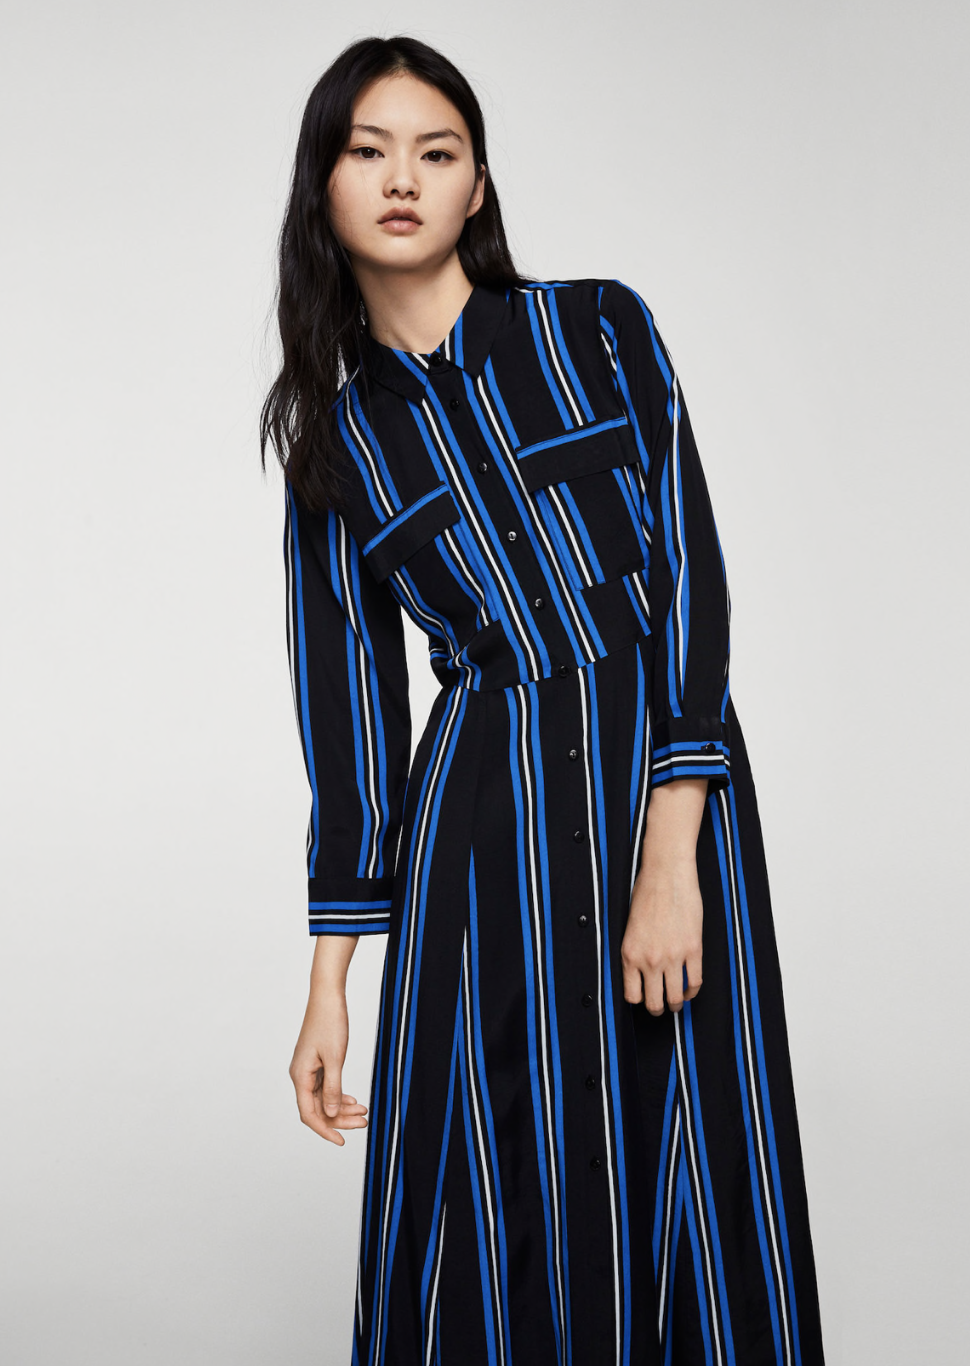 striped shirt dress – $79.99